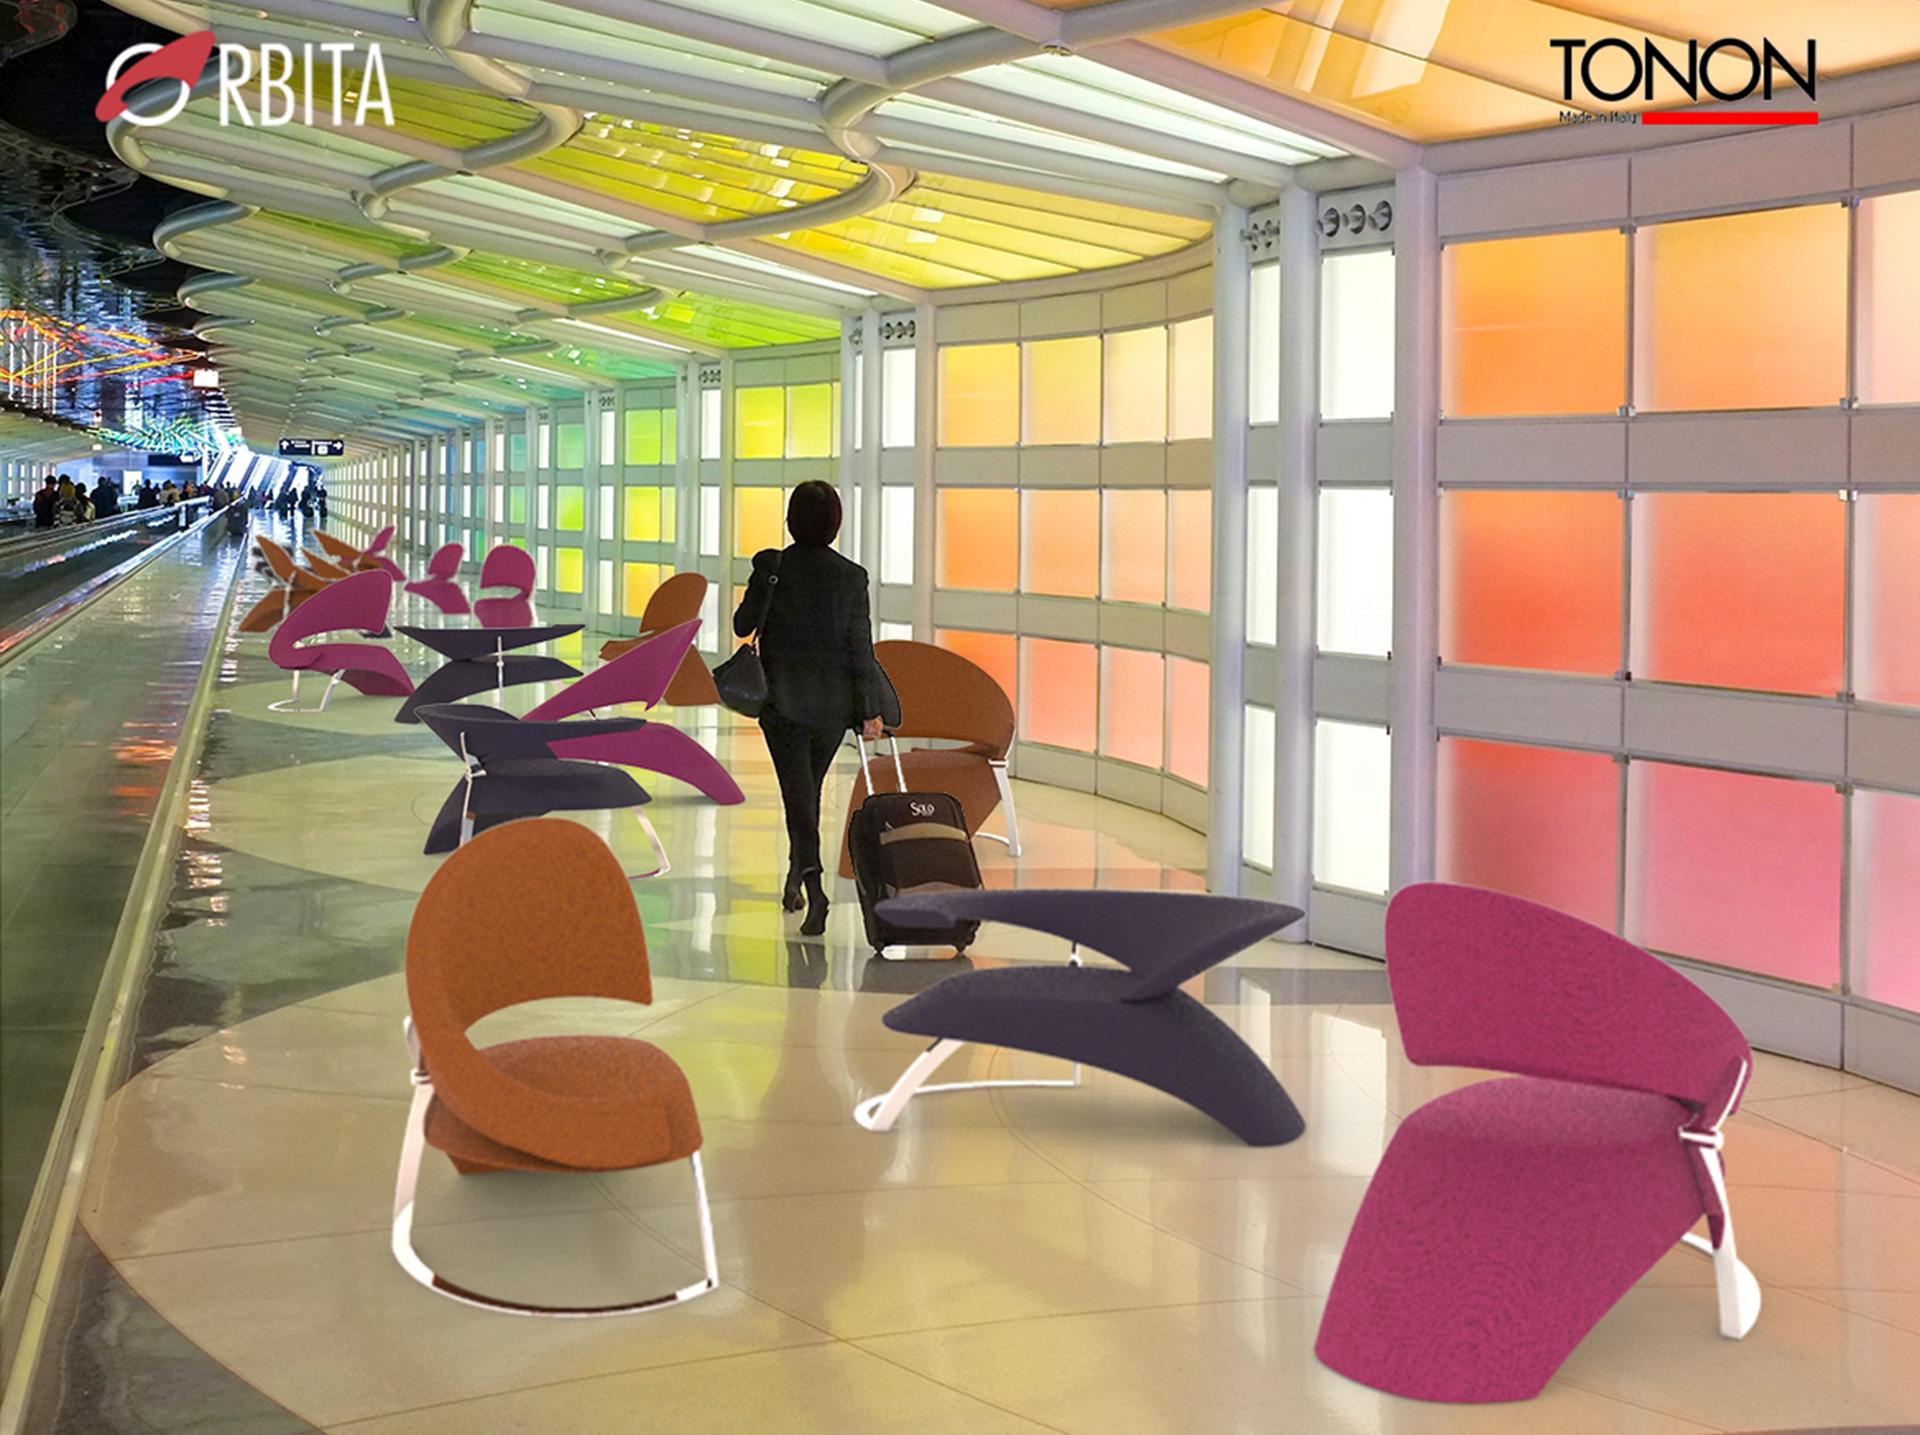 Orbita-poltrona-aereoporti-lounge-Tonon